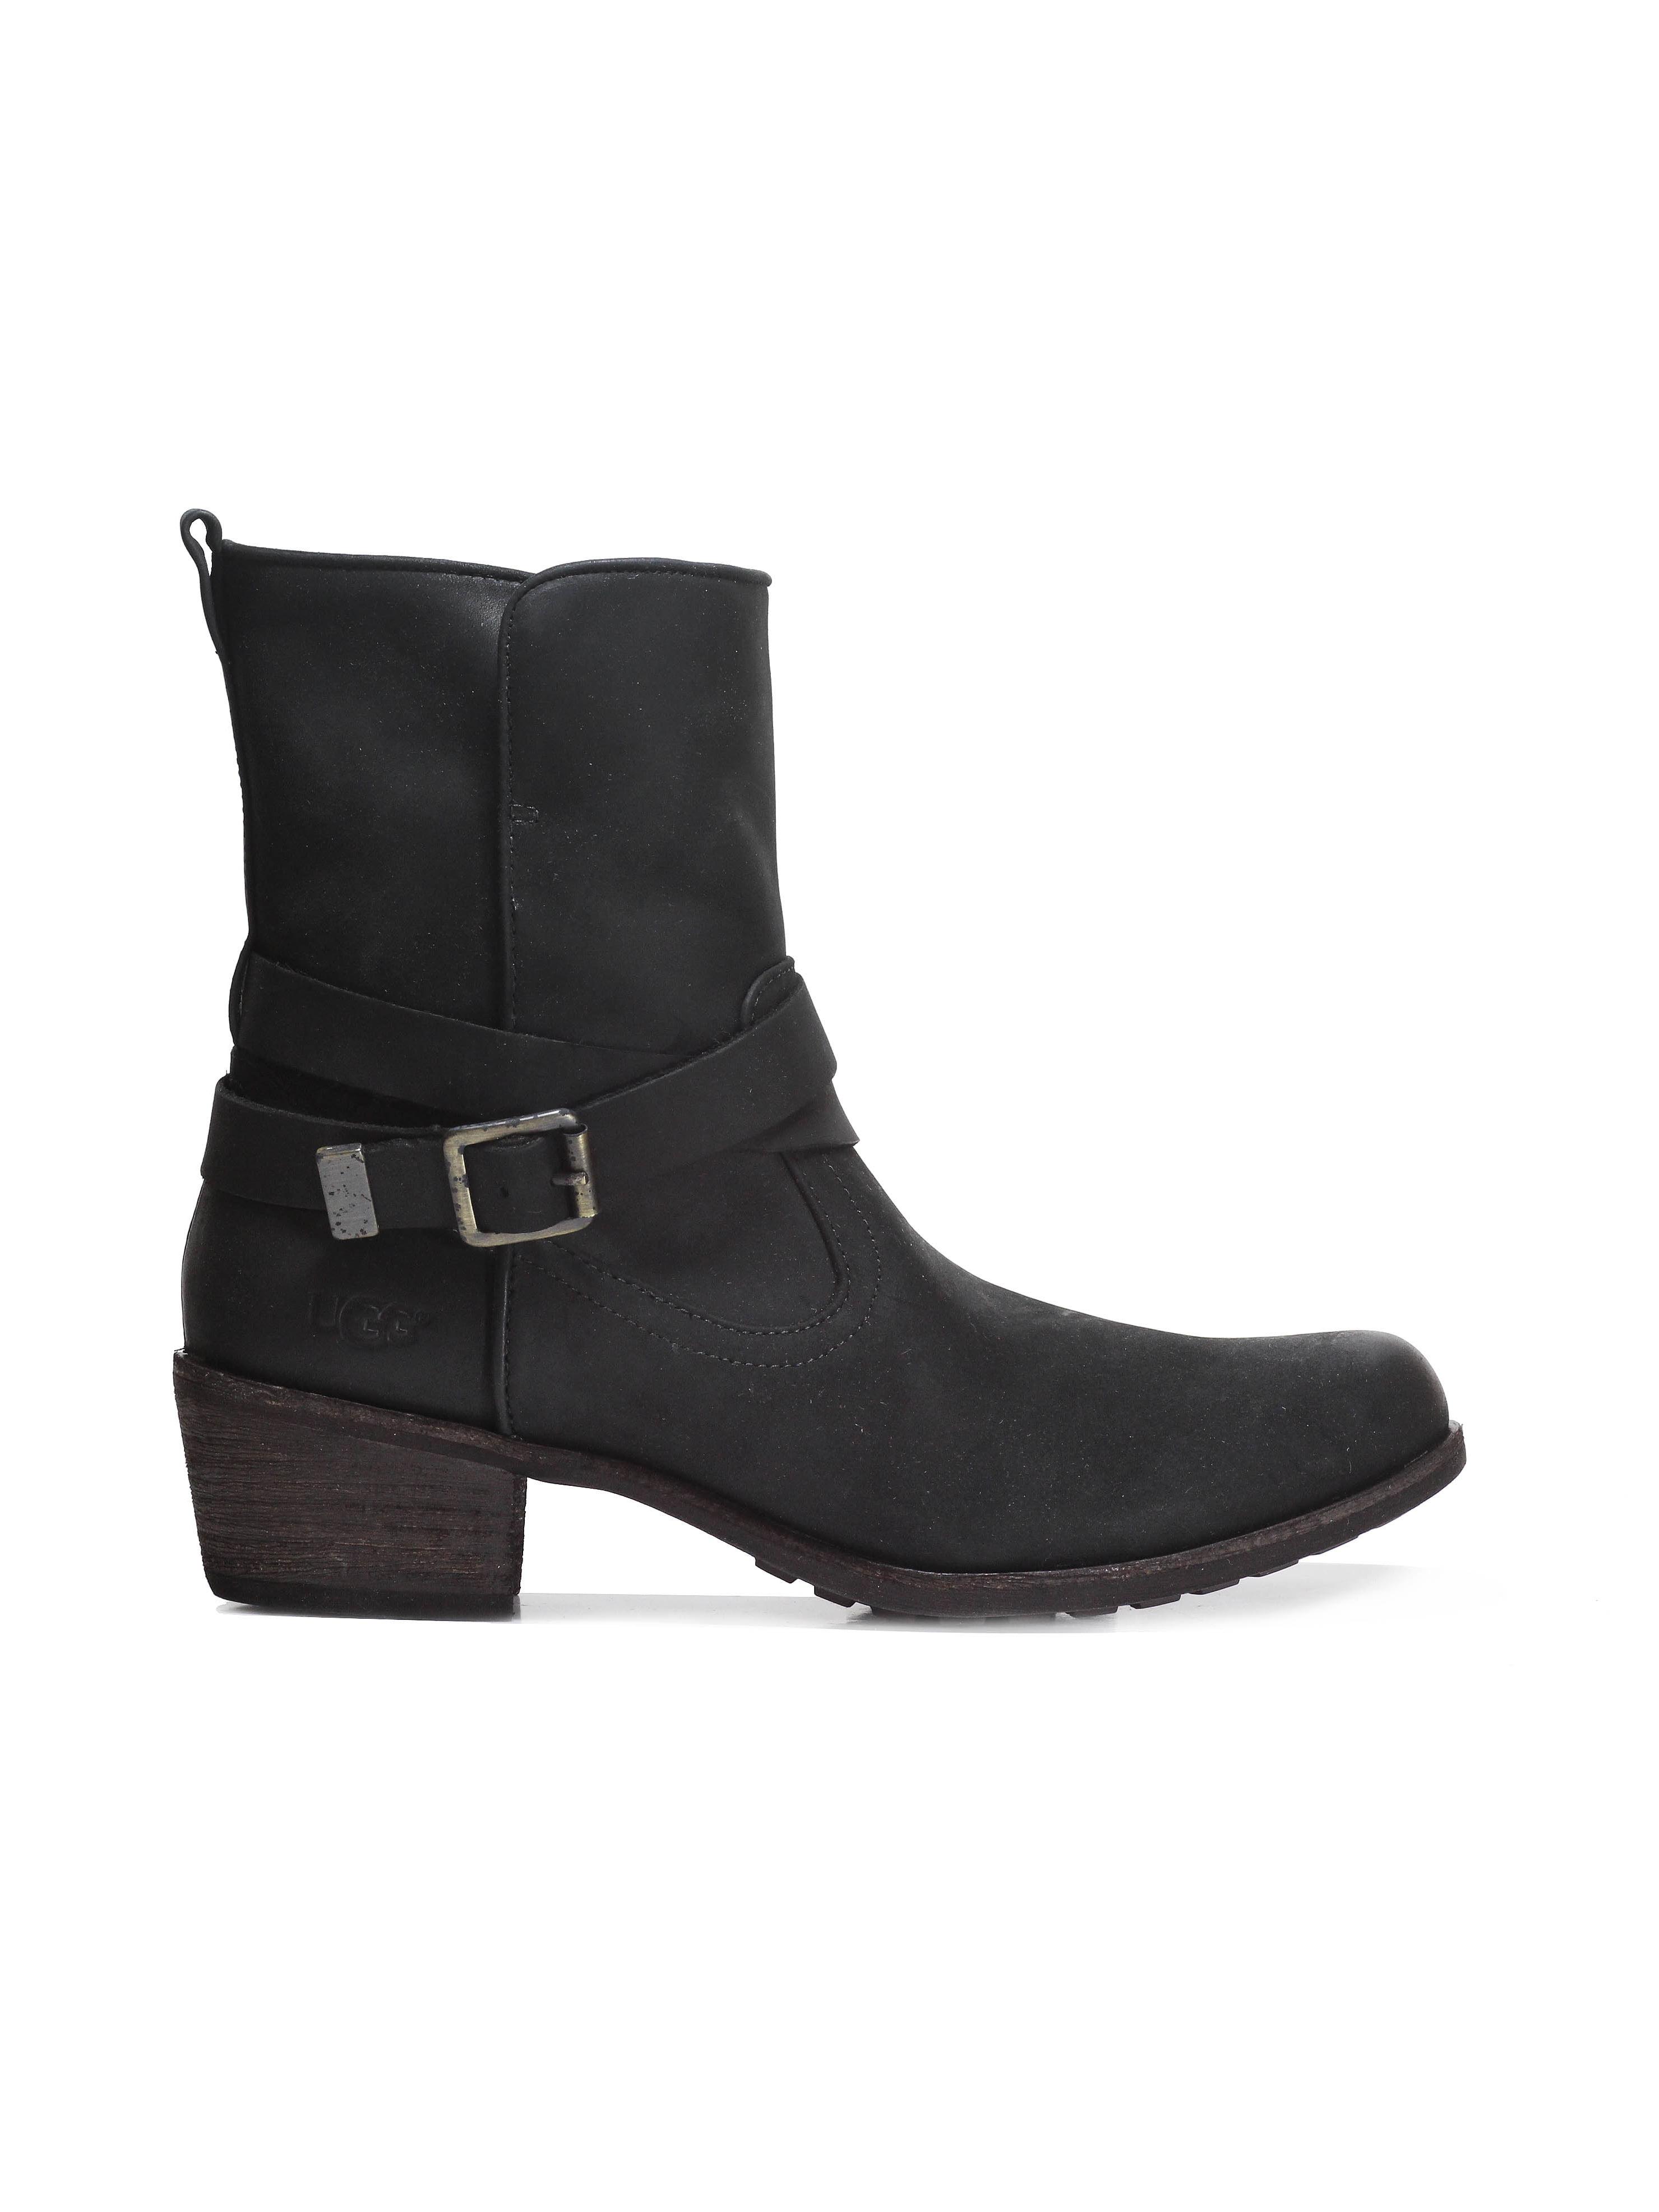 6a2bfc9ce51 UGG Women's Lorraine Boot Black - 5